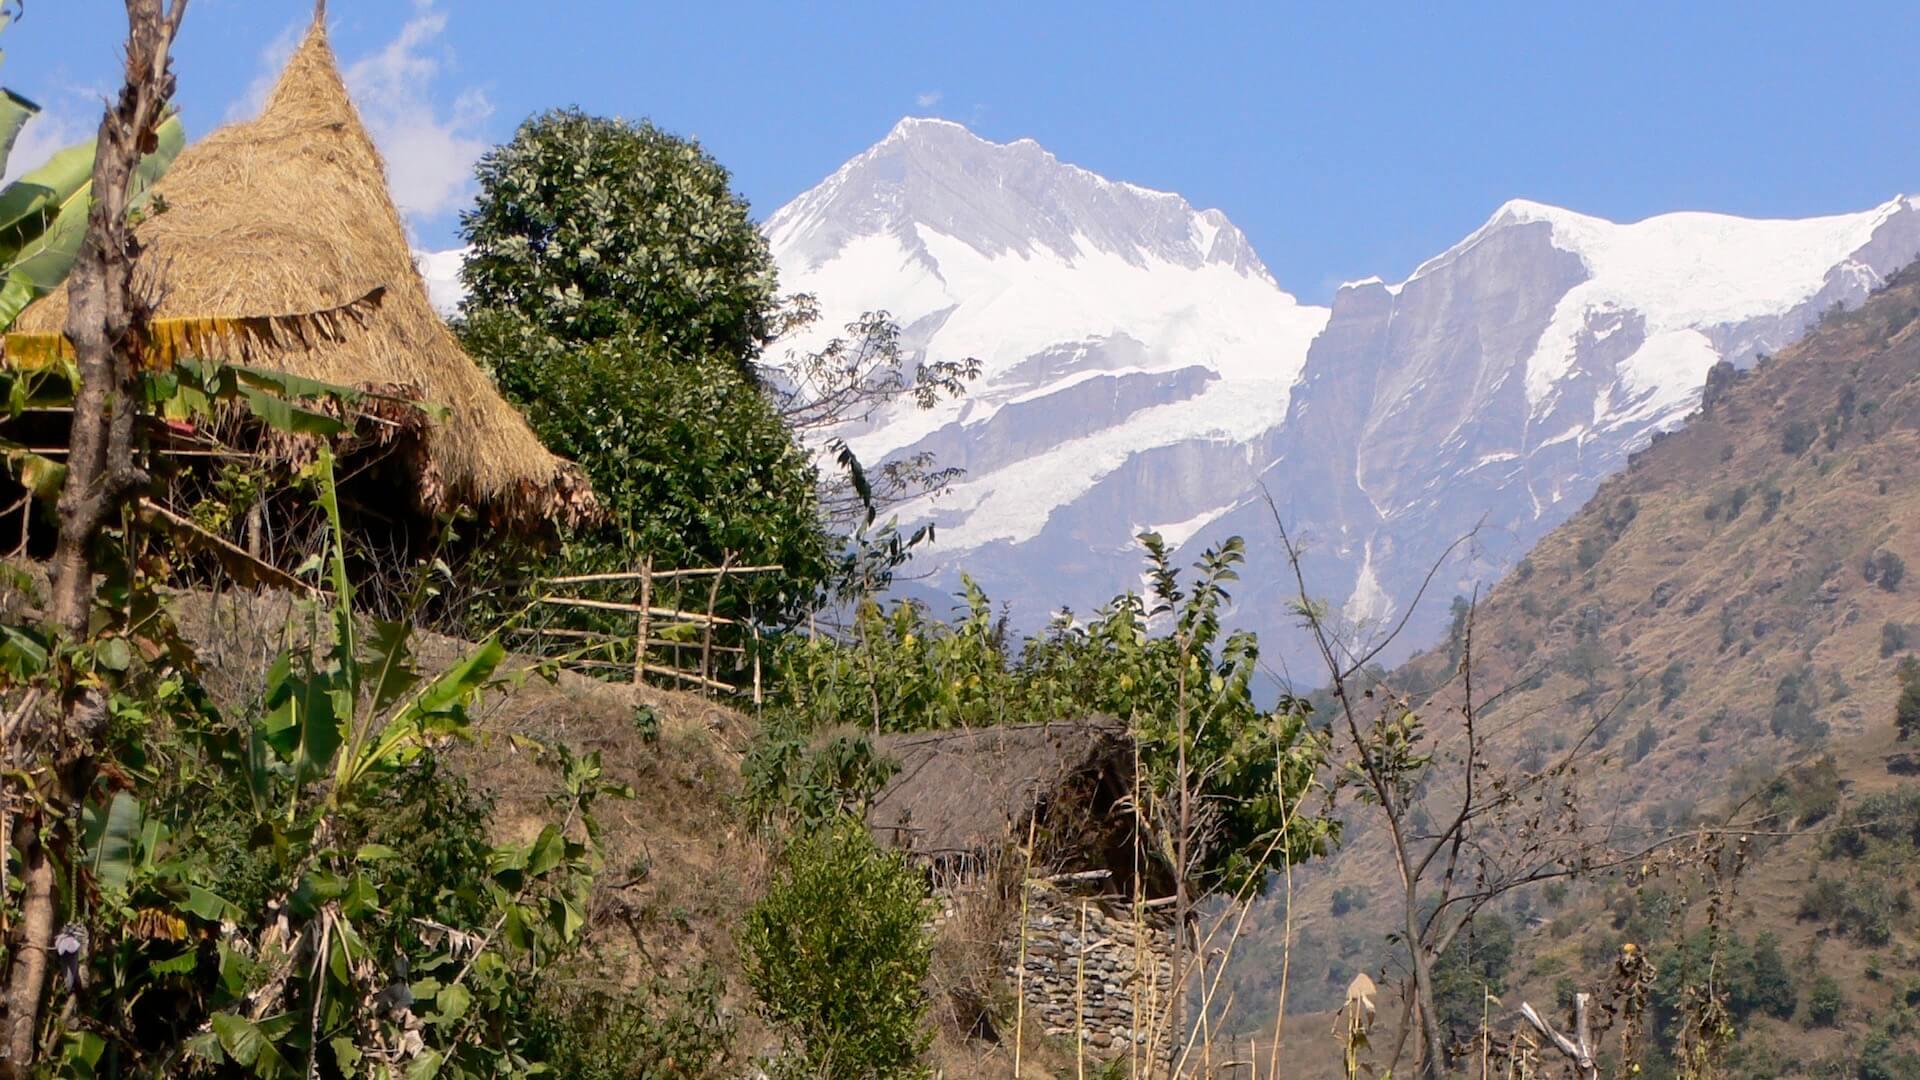 Photo by Manjushree Thapa